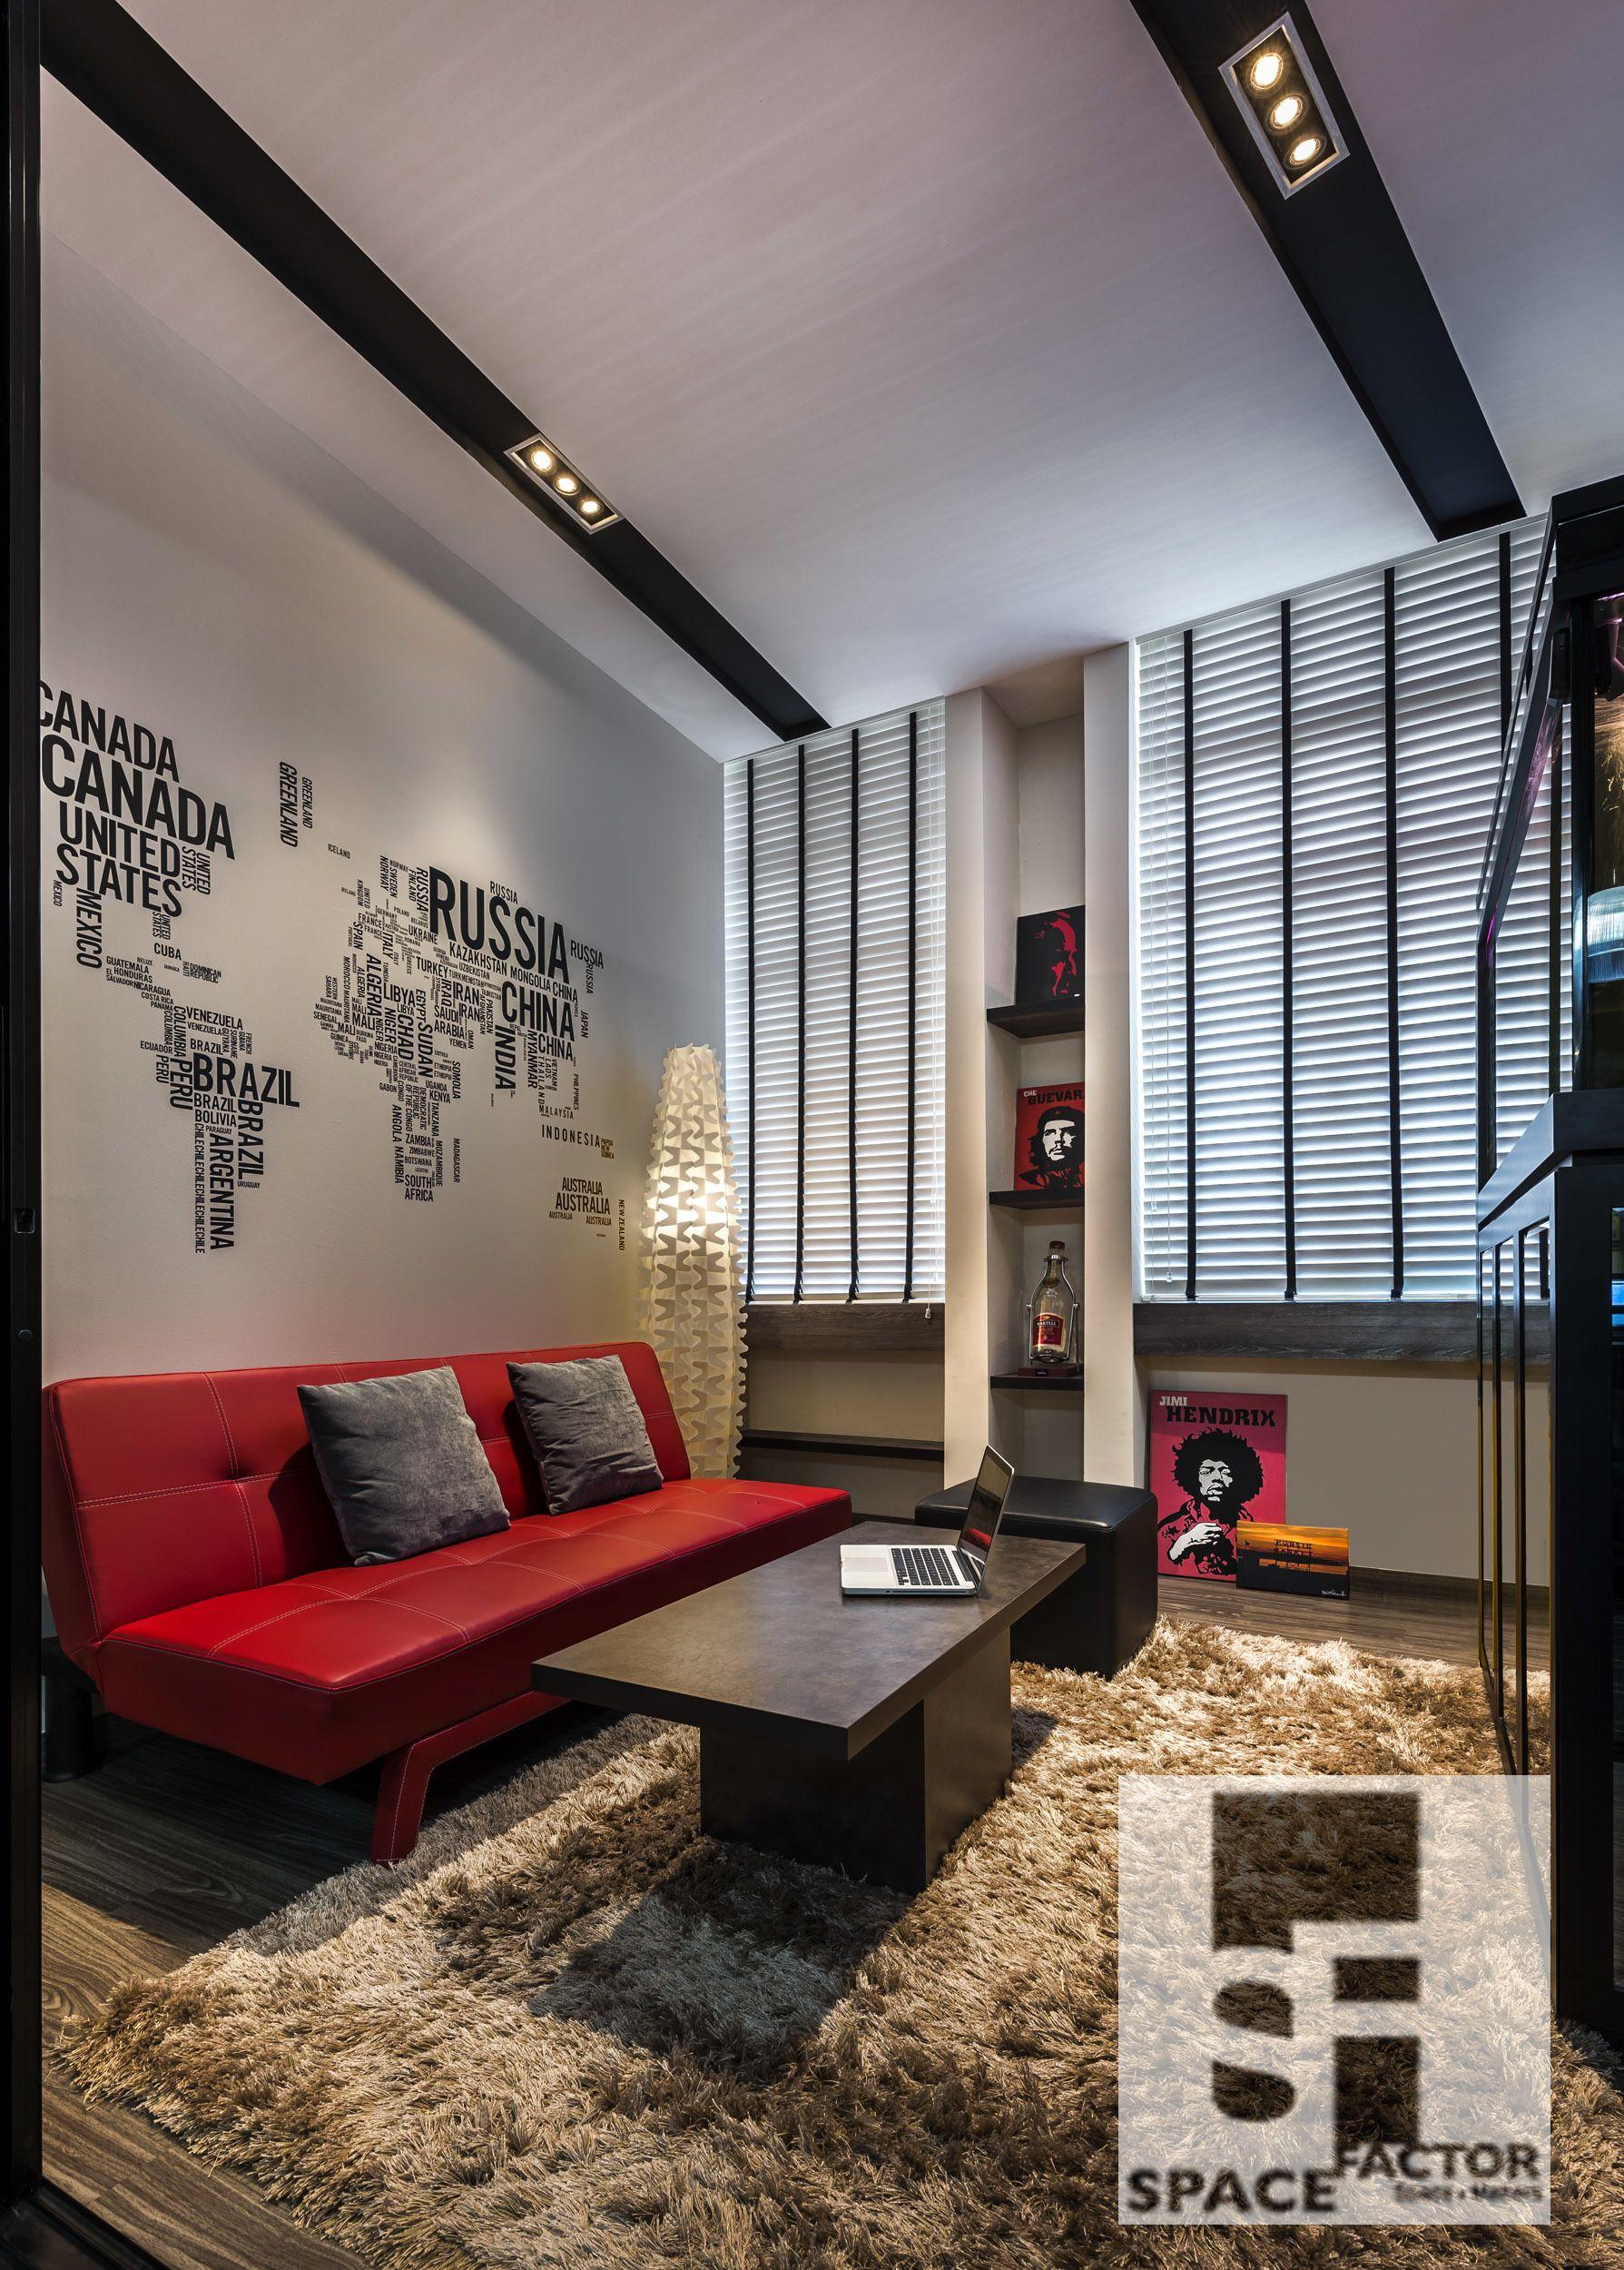 Office Manager Room Design Spacefactor Office Interiordesign Showroom Interior Design Kitchen Interior Design Modern Interior Design Website